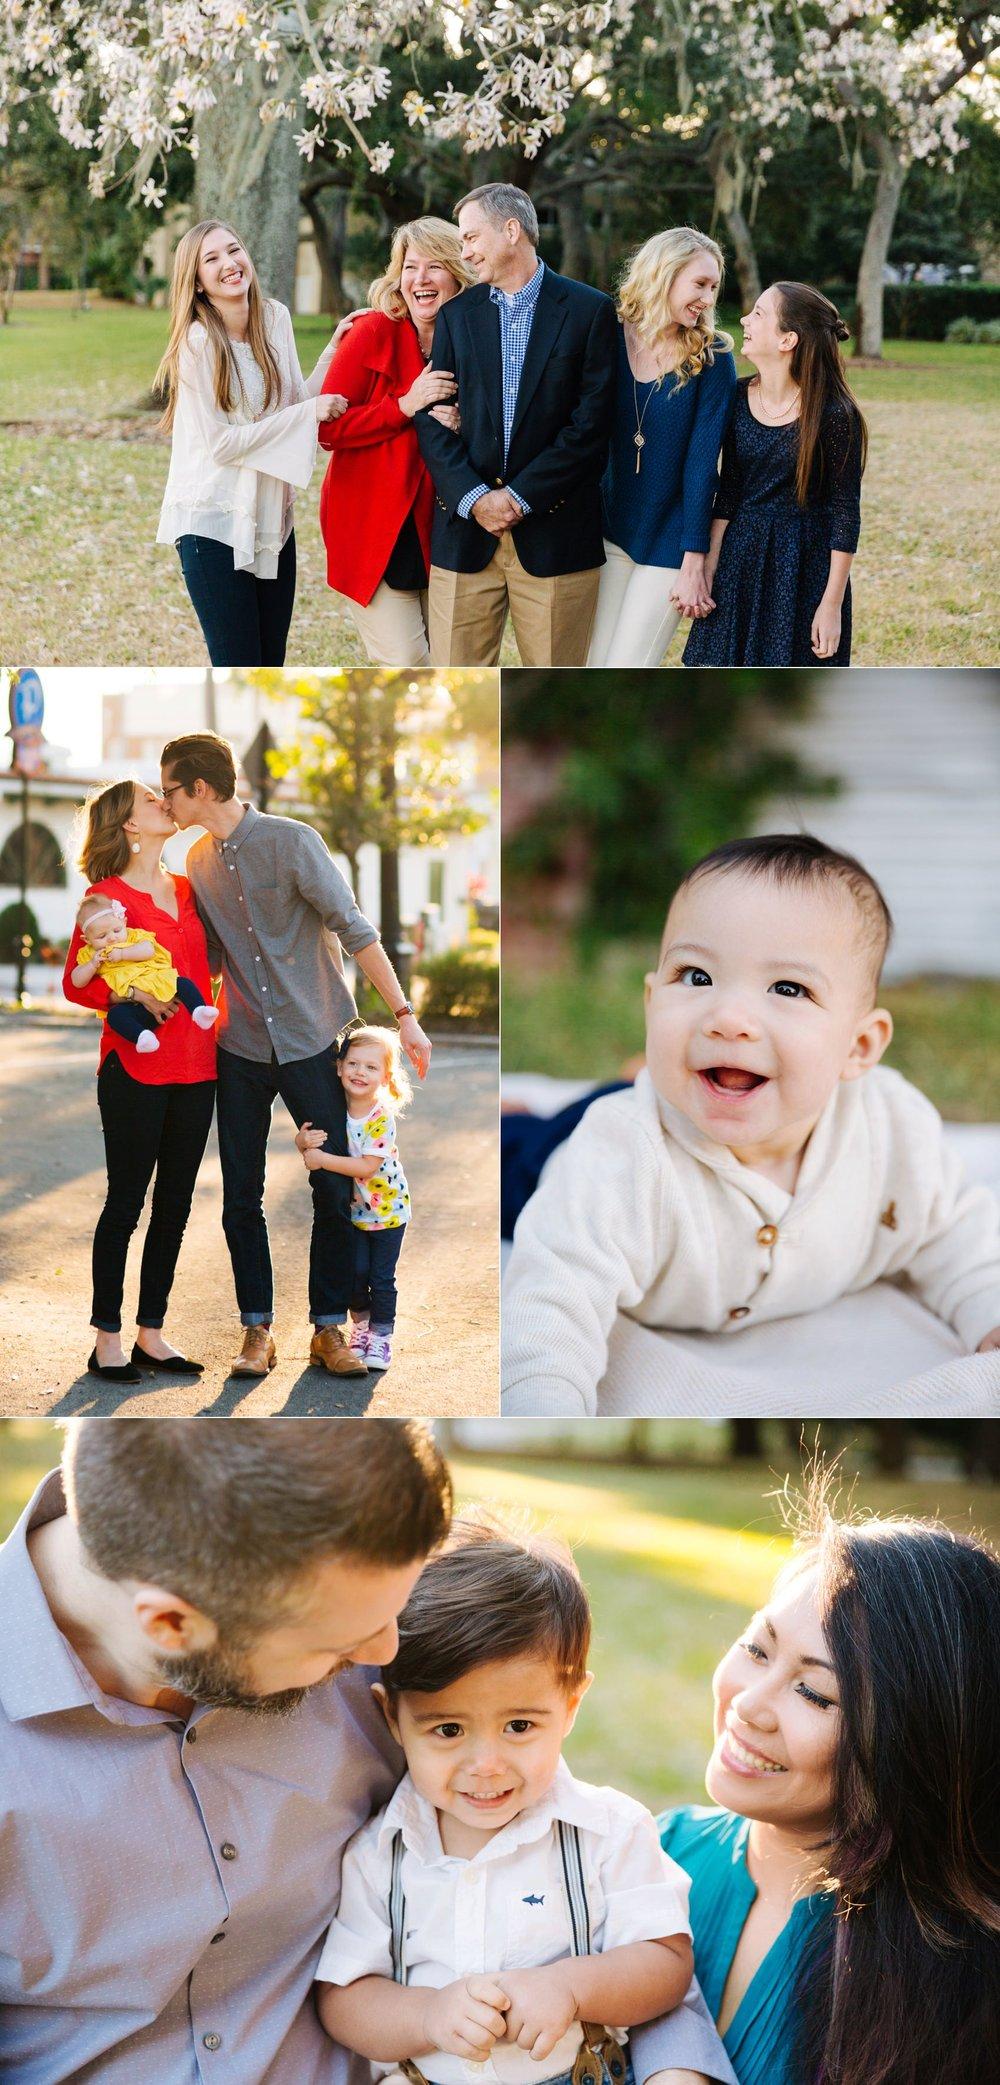 Jake & Katie's Best of Families 2016-019.jpg